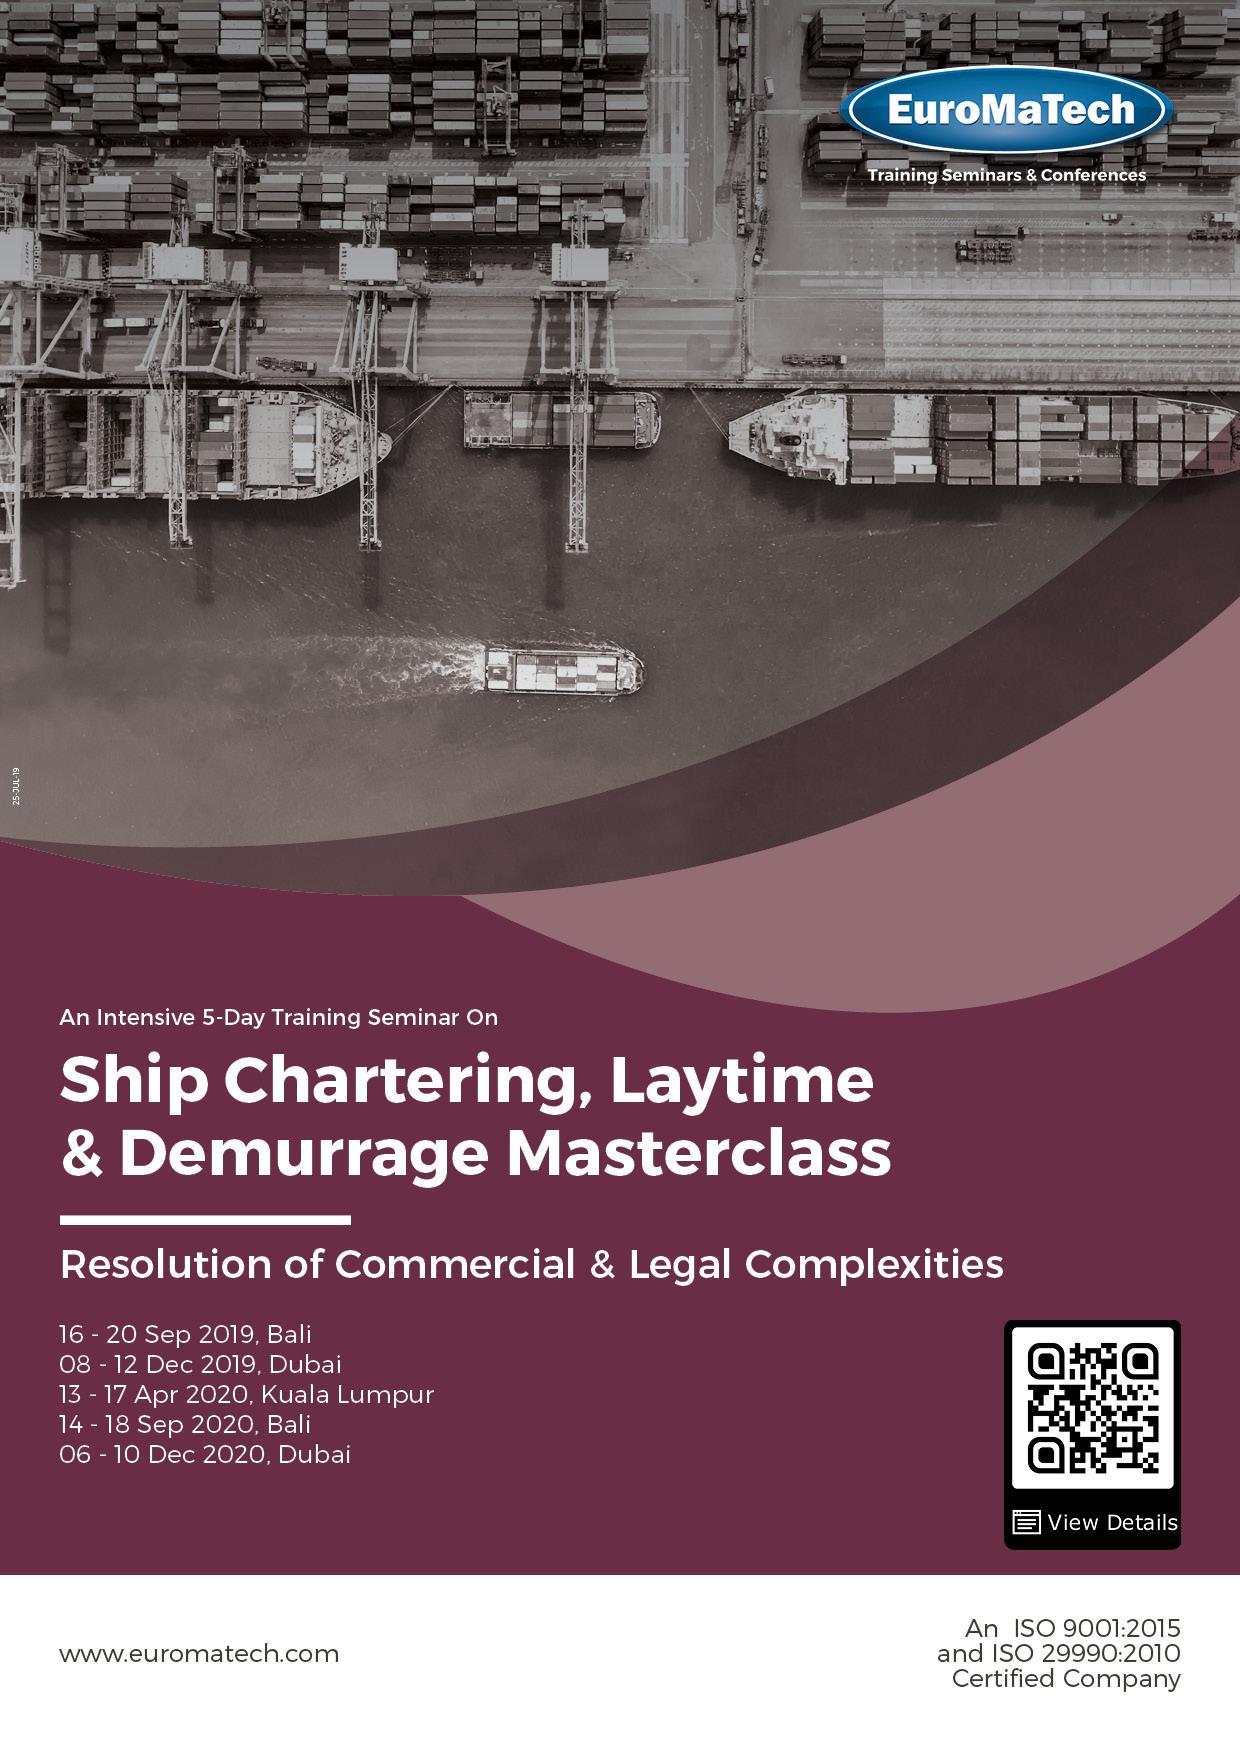 Ship Chartering, Laytime & Demurrage Masterclass Thumbnail